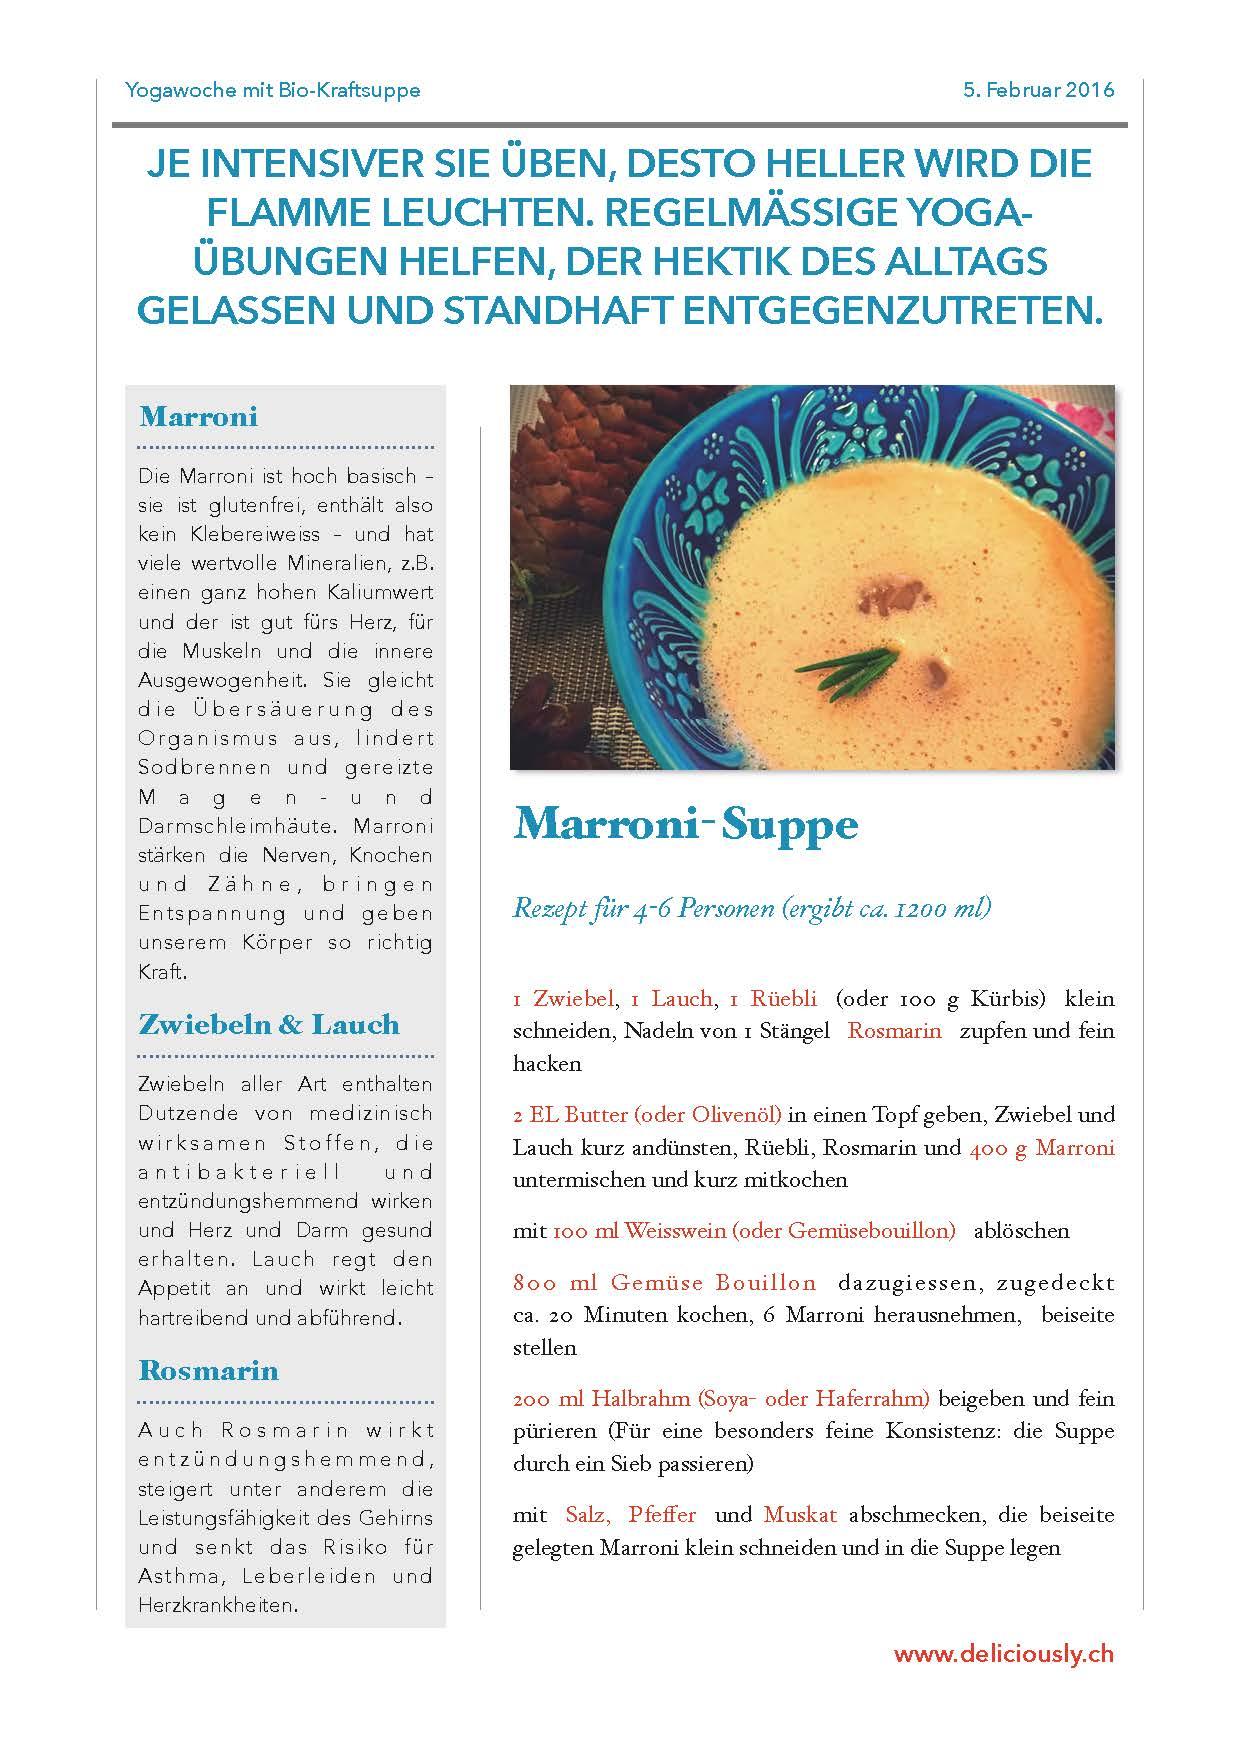 Marronisuppe